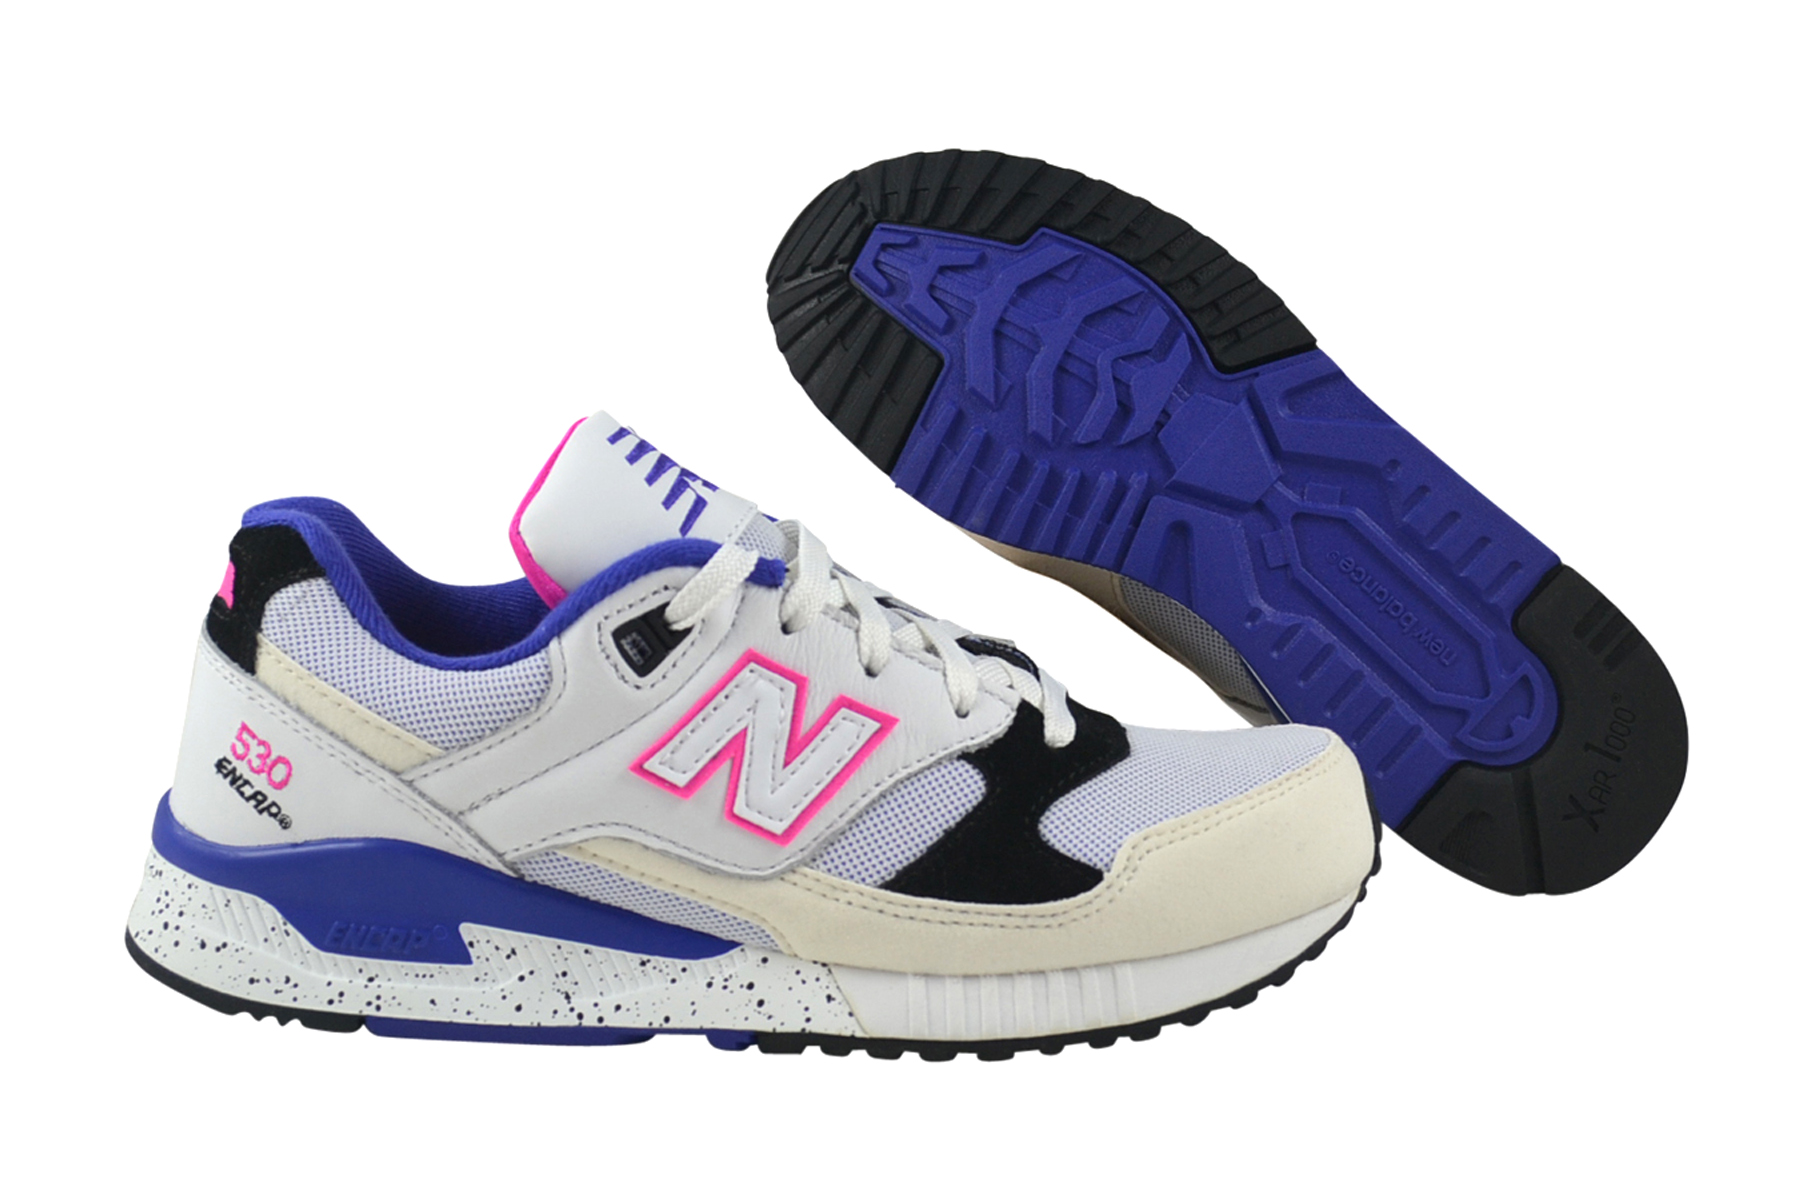 f09b2b67da420e New Balance M530 KIE white purple Sneaker Schuhe weiß